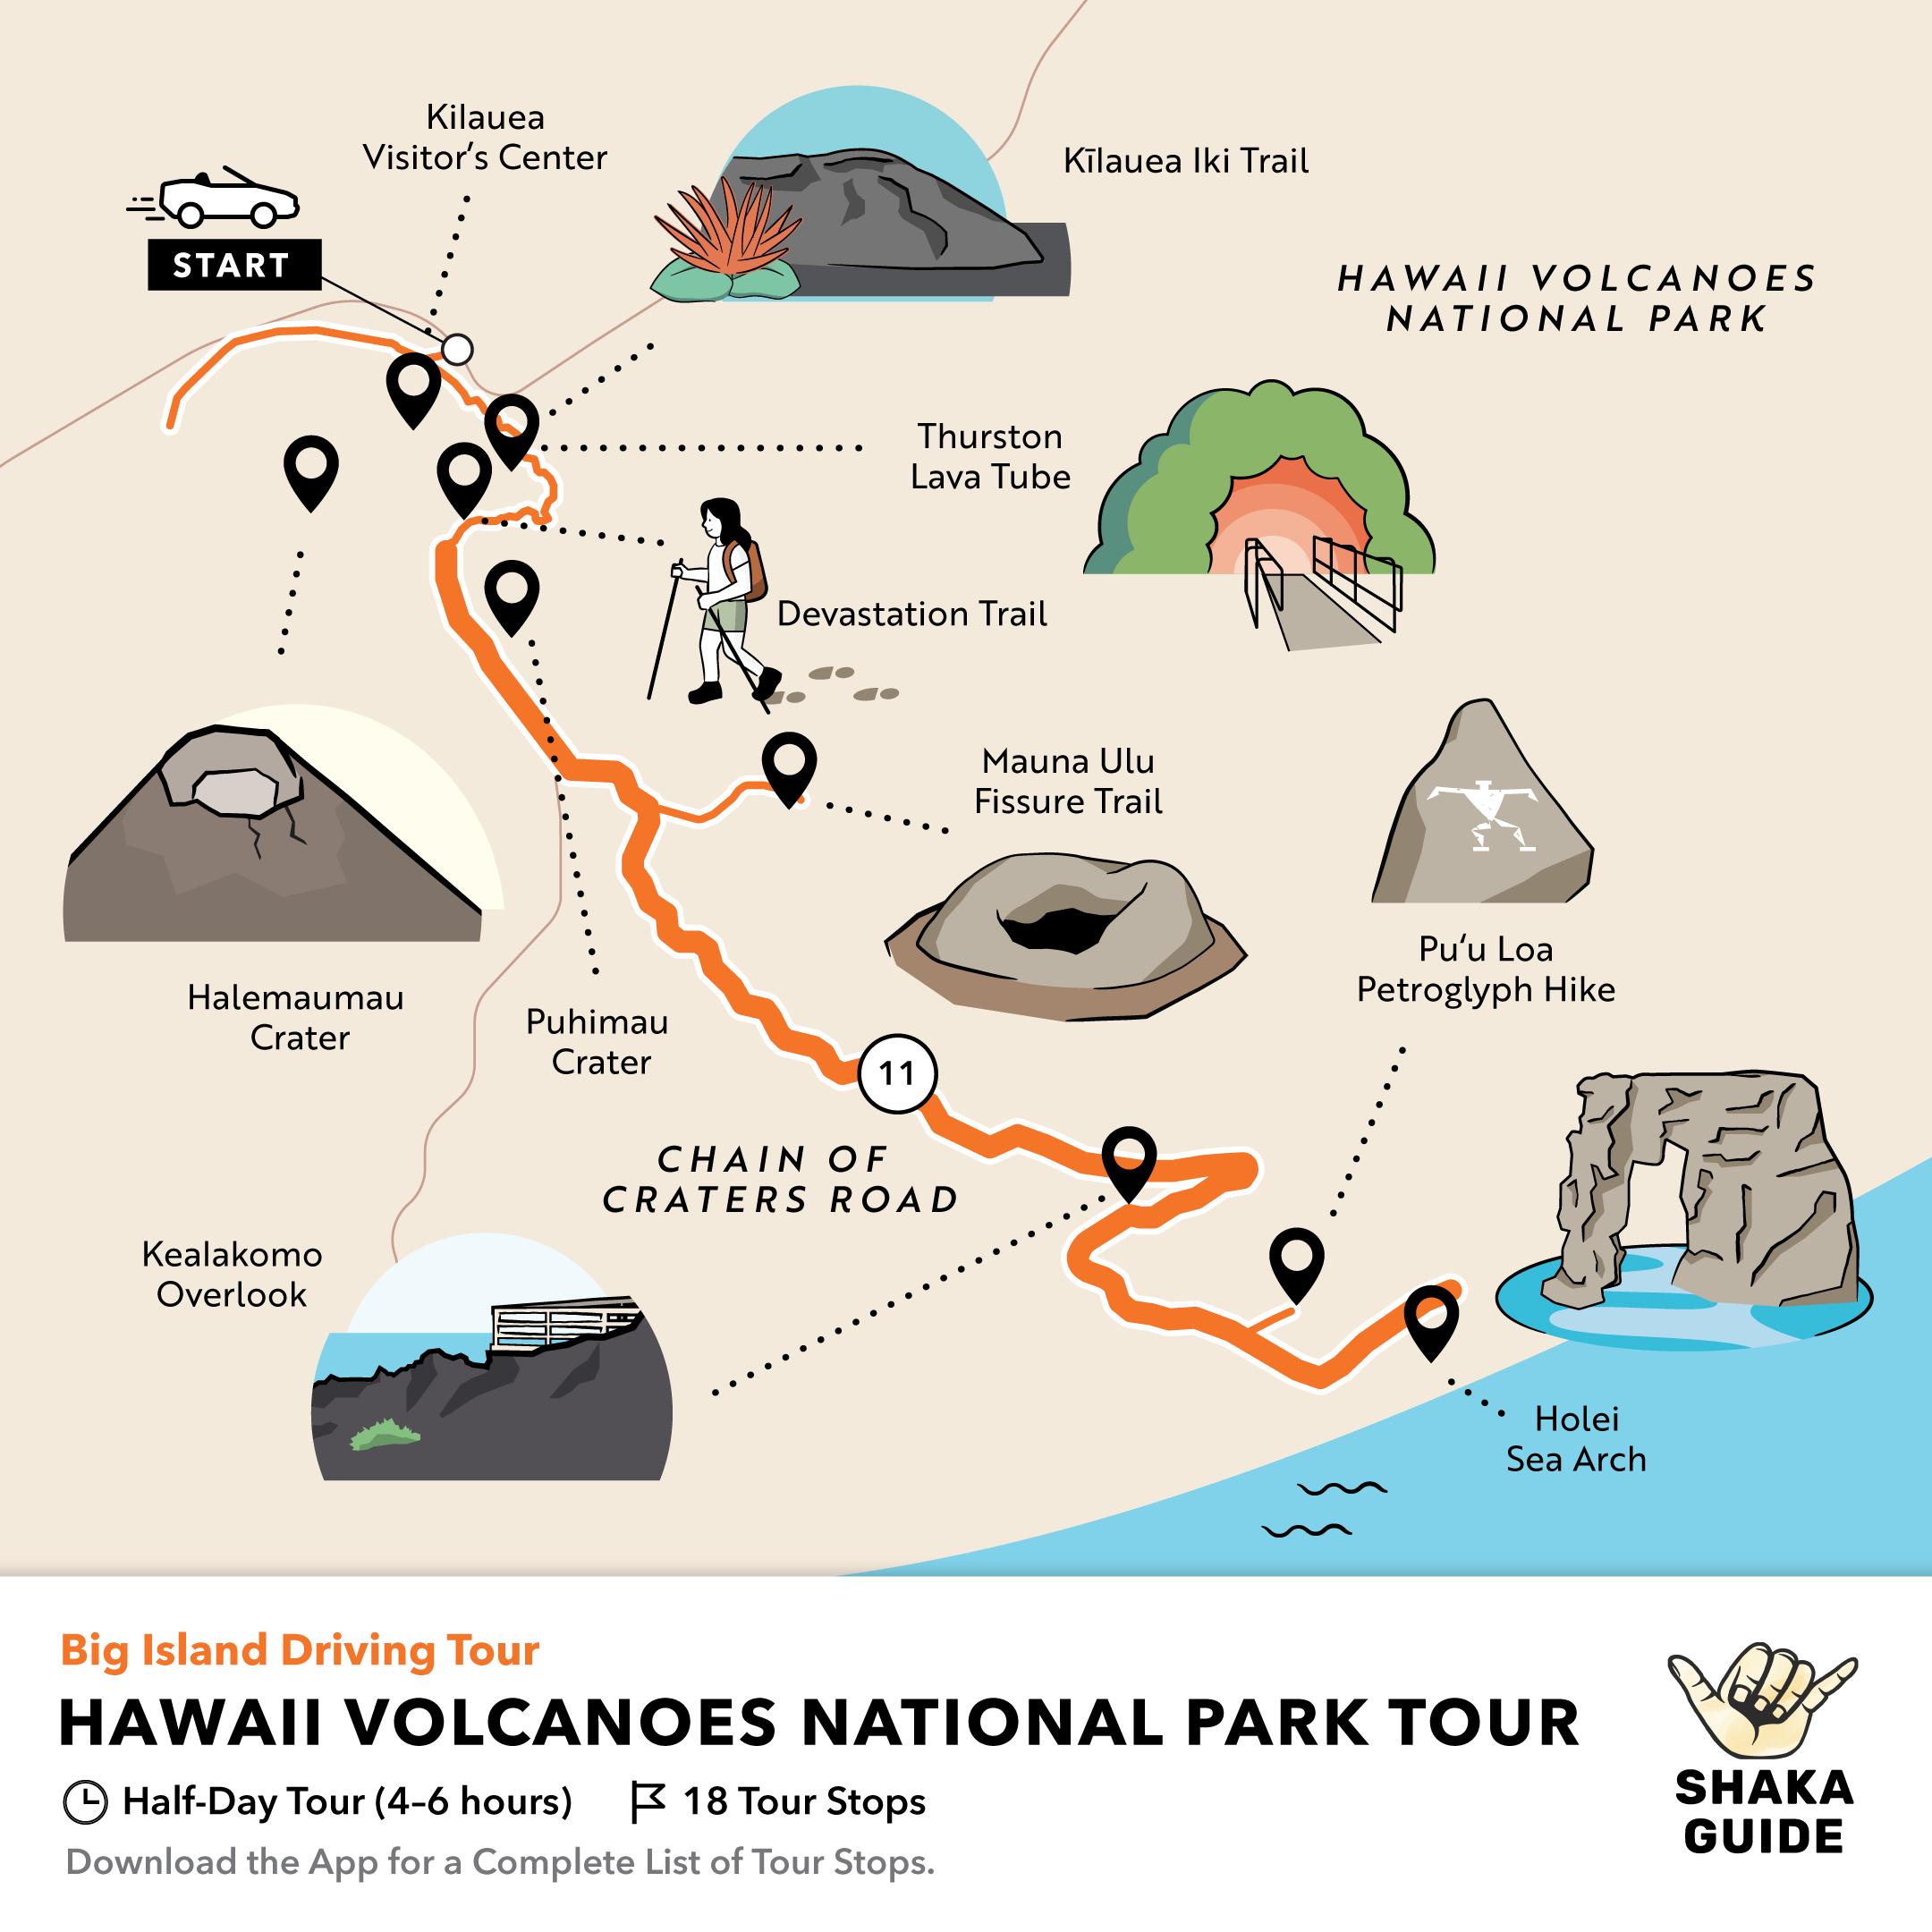 Shaka Guide's Hawaii Volcanoes National Park Tour